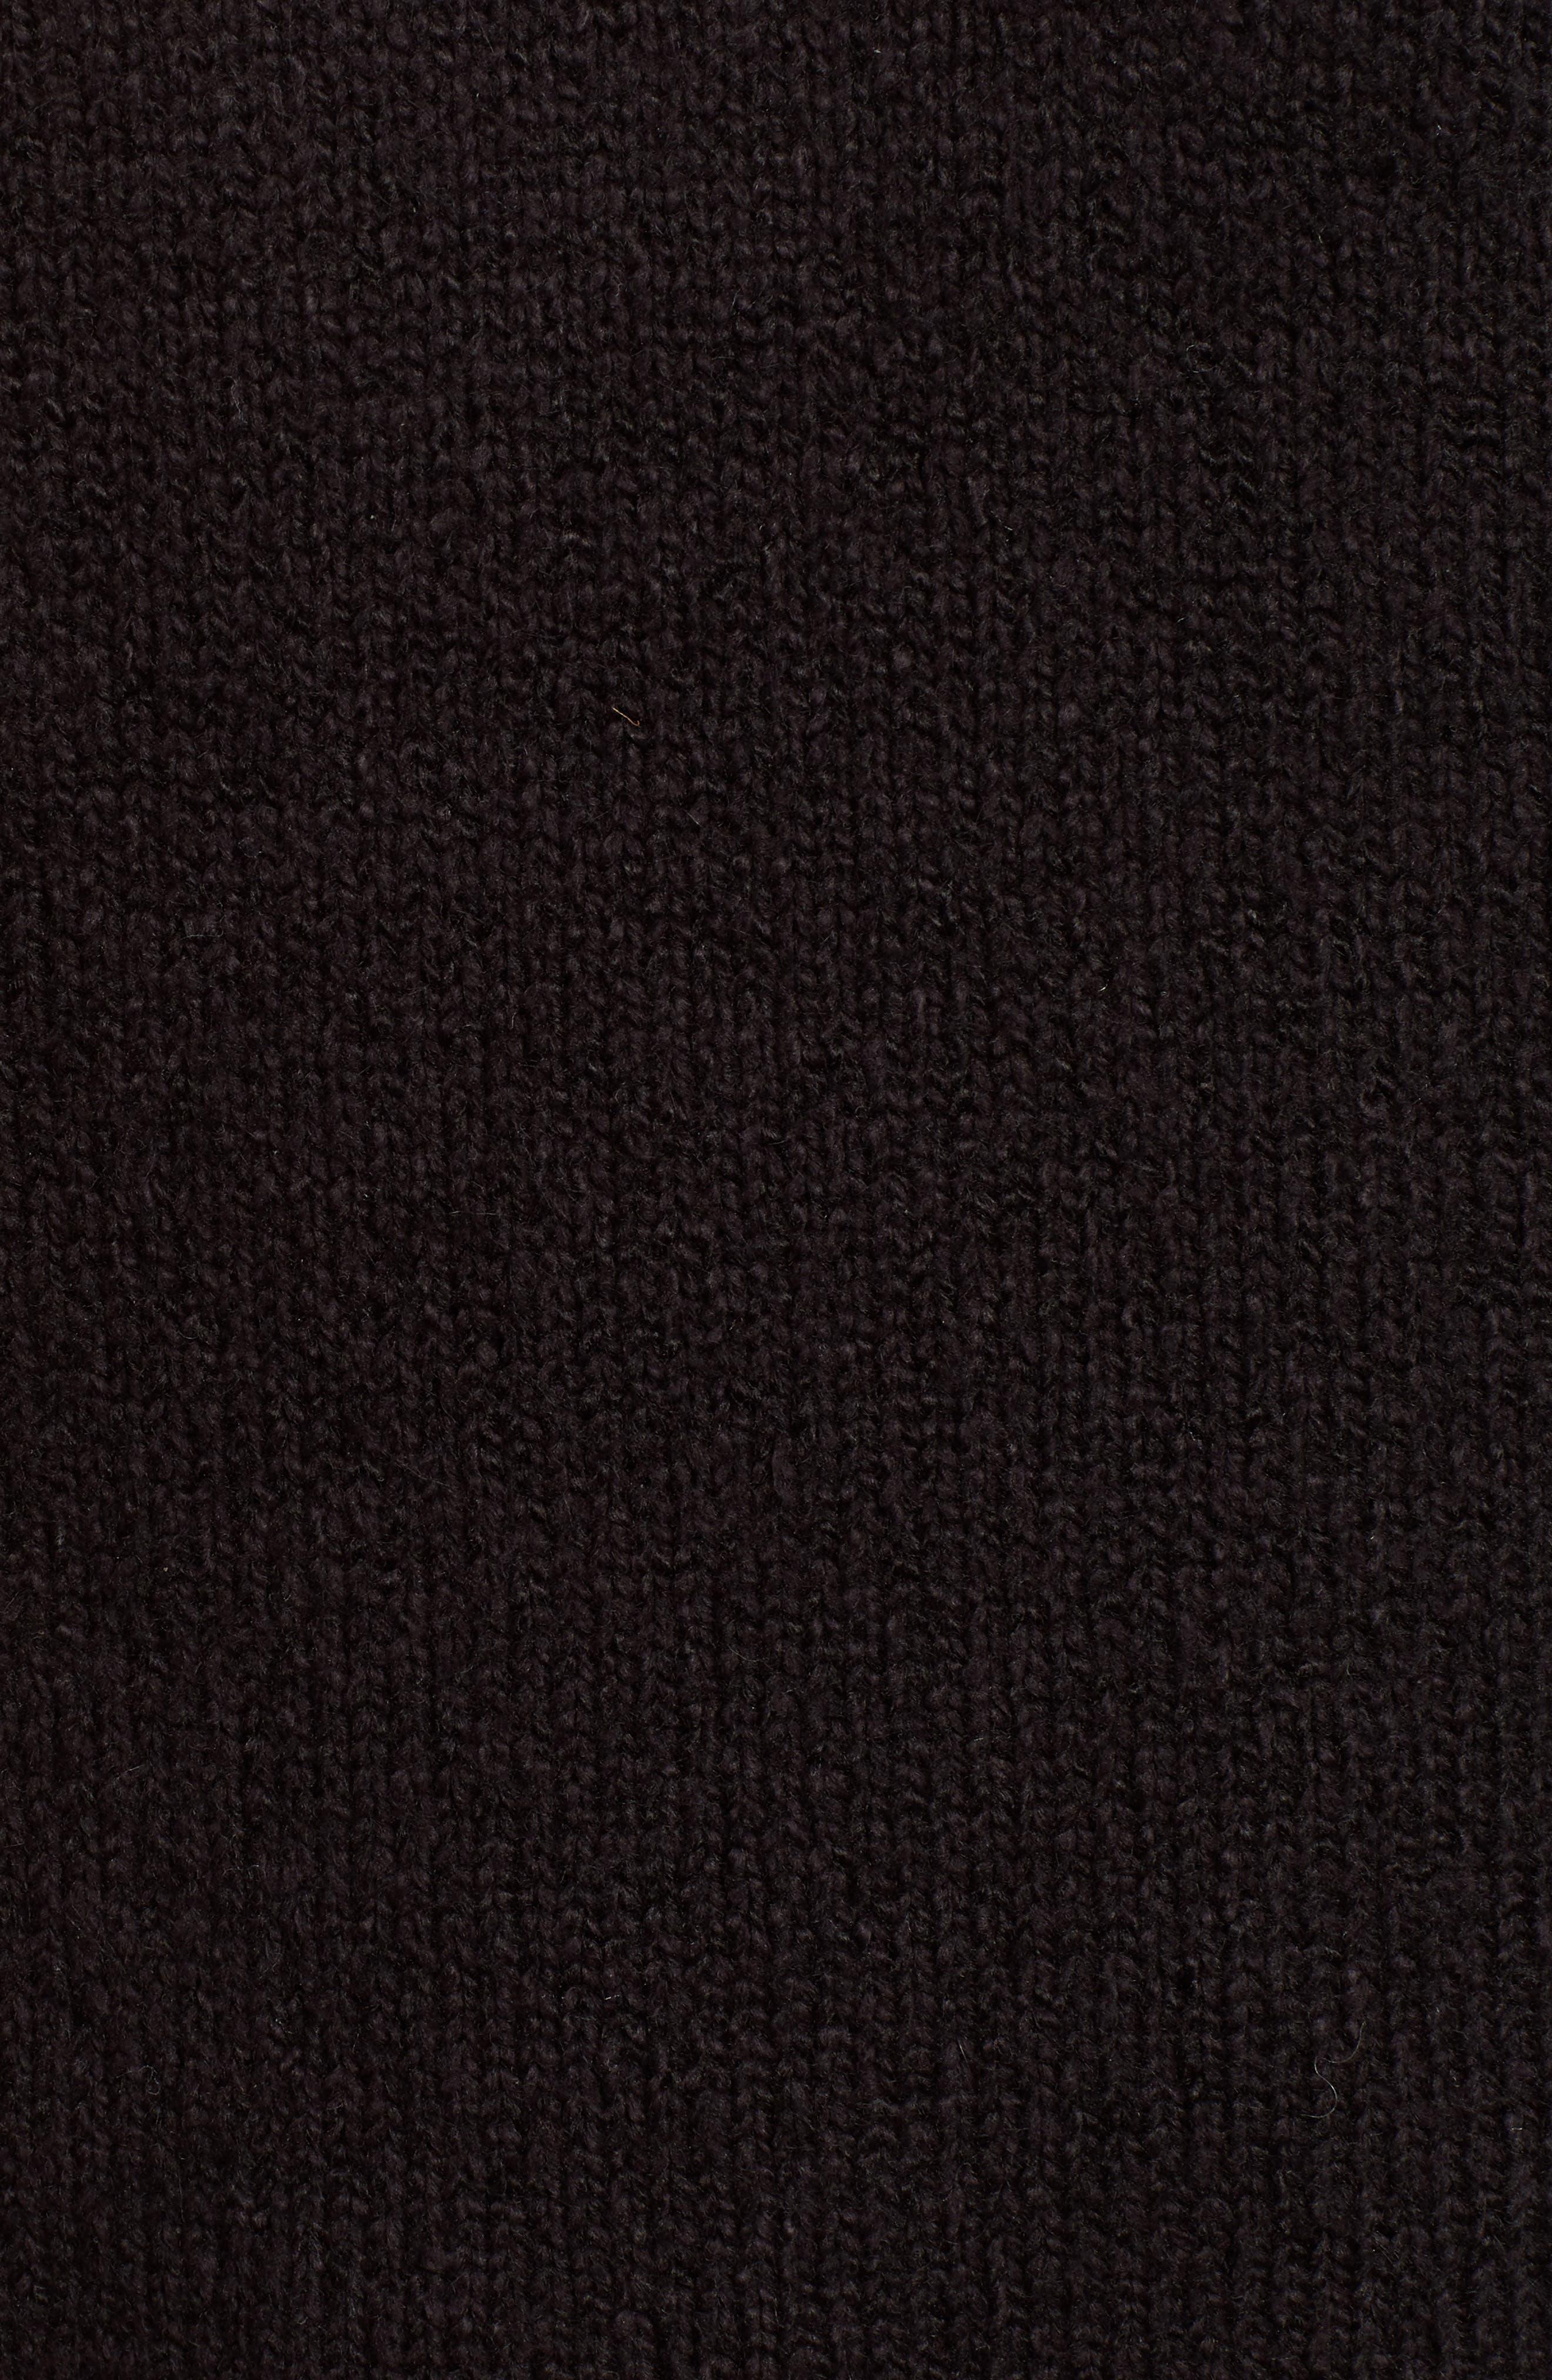 Stripe Sleeve Cotton Blend Sweater,                             Alternate thumbnail 5, color,                             BLACK